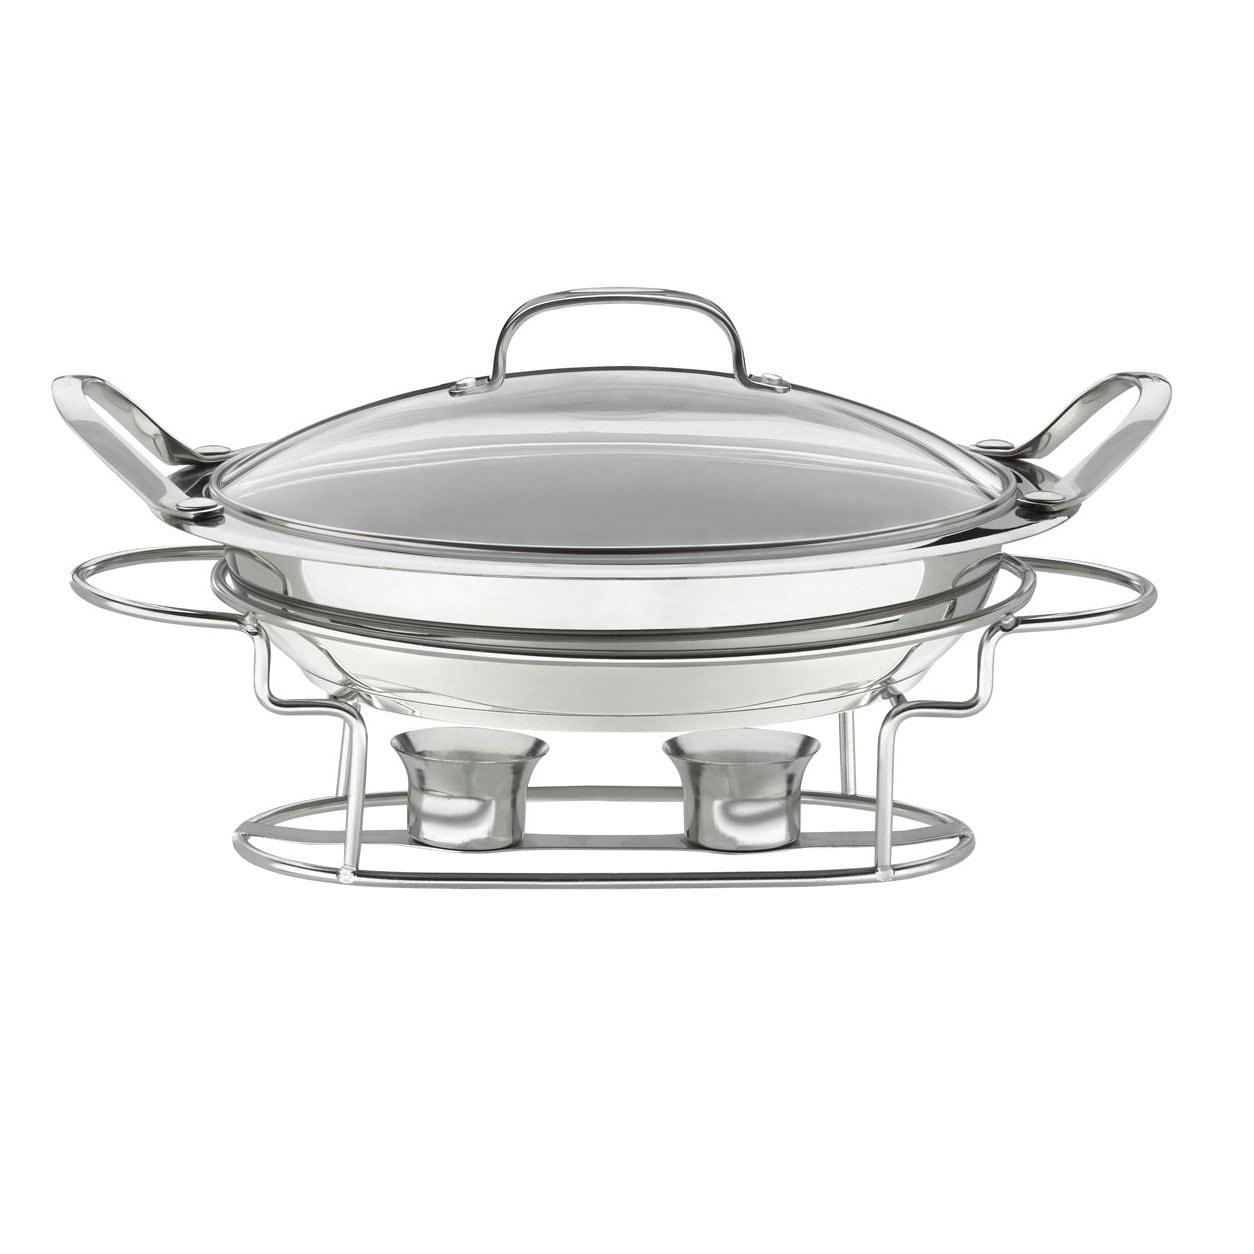 Cuisinart Stainless Steel Round 3-quart 12-inch Buffet Se...